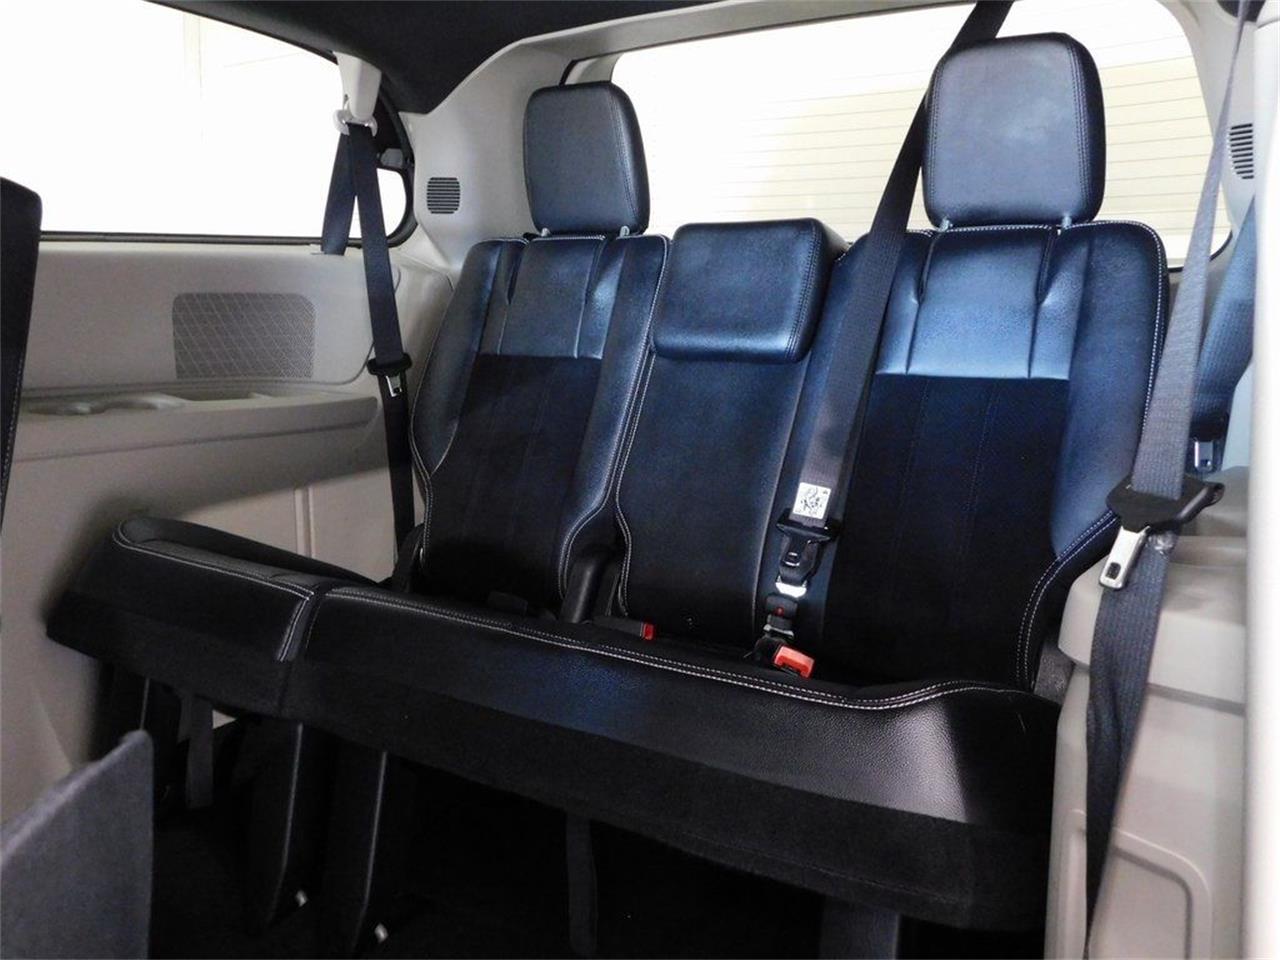 2014 Dodge Grand Caravan (CC-1409786) for sale in Hamburg, New York